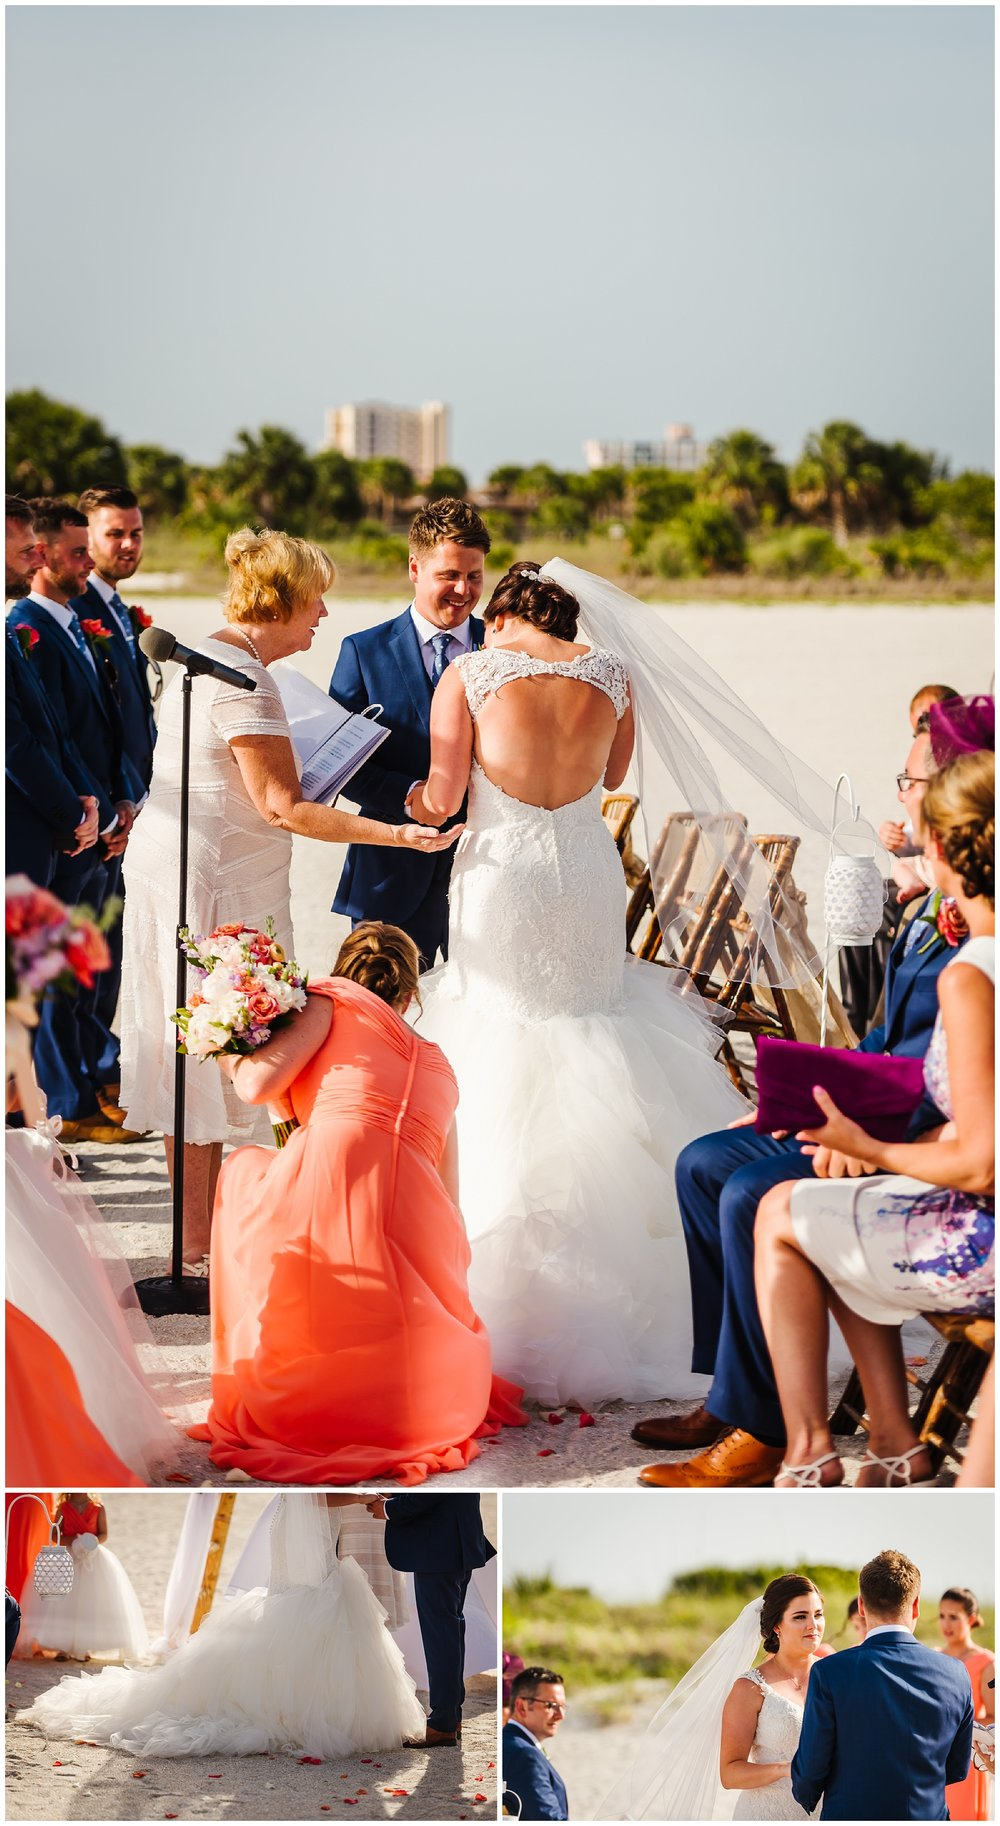 Clearwater-destination-wedding-photographer-jimmy-choo-yves-st-laurent-sunset_0084.jpg